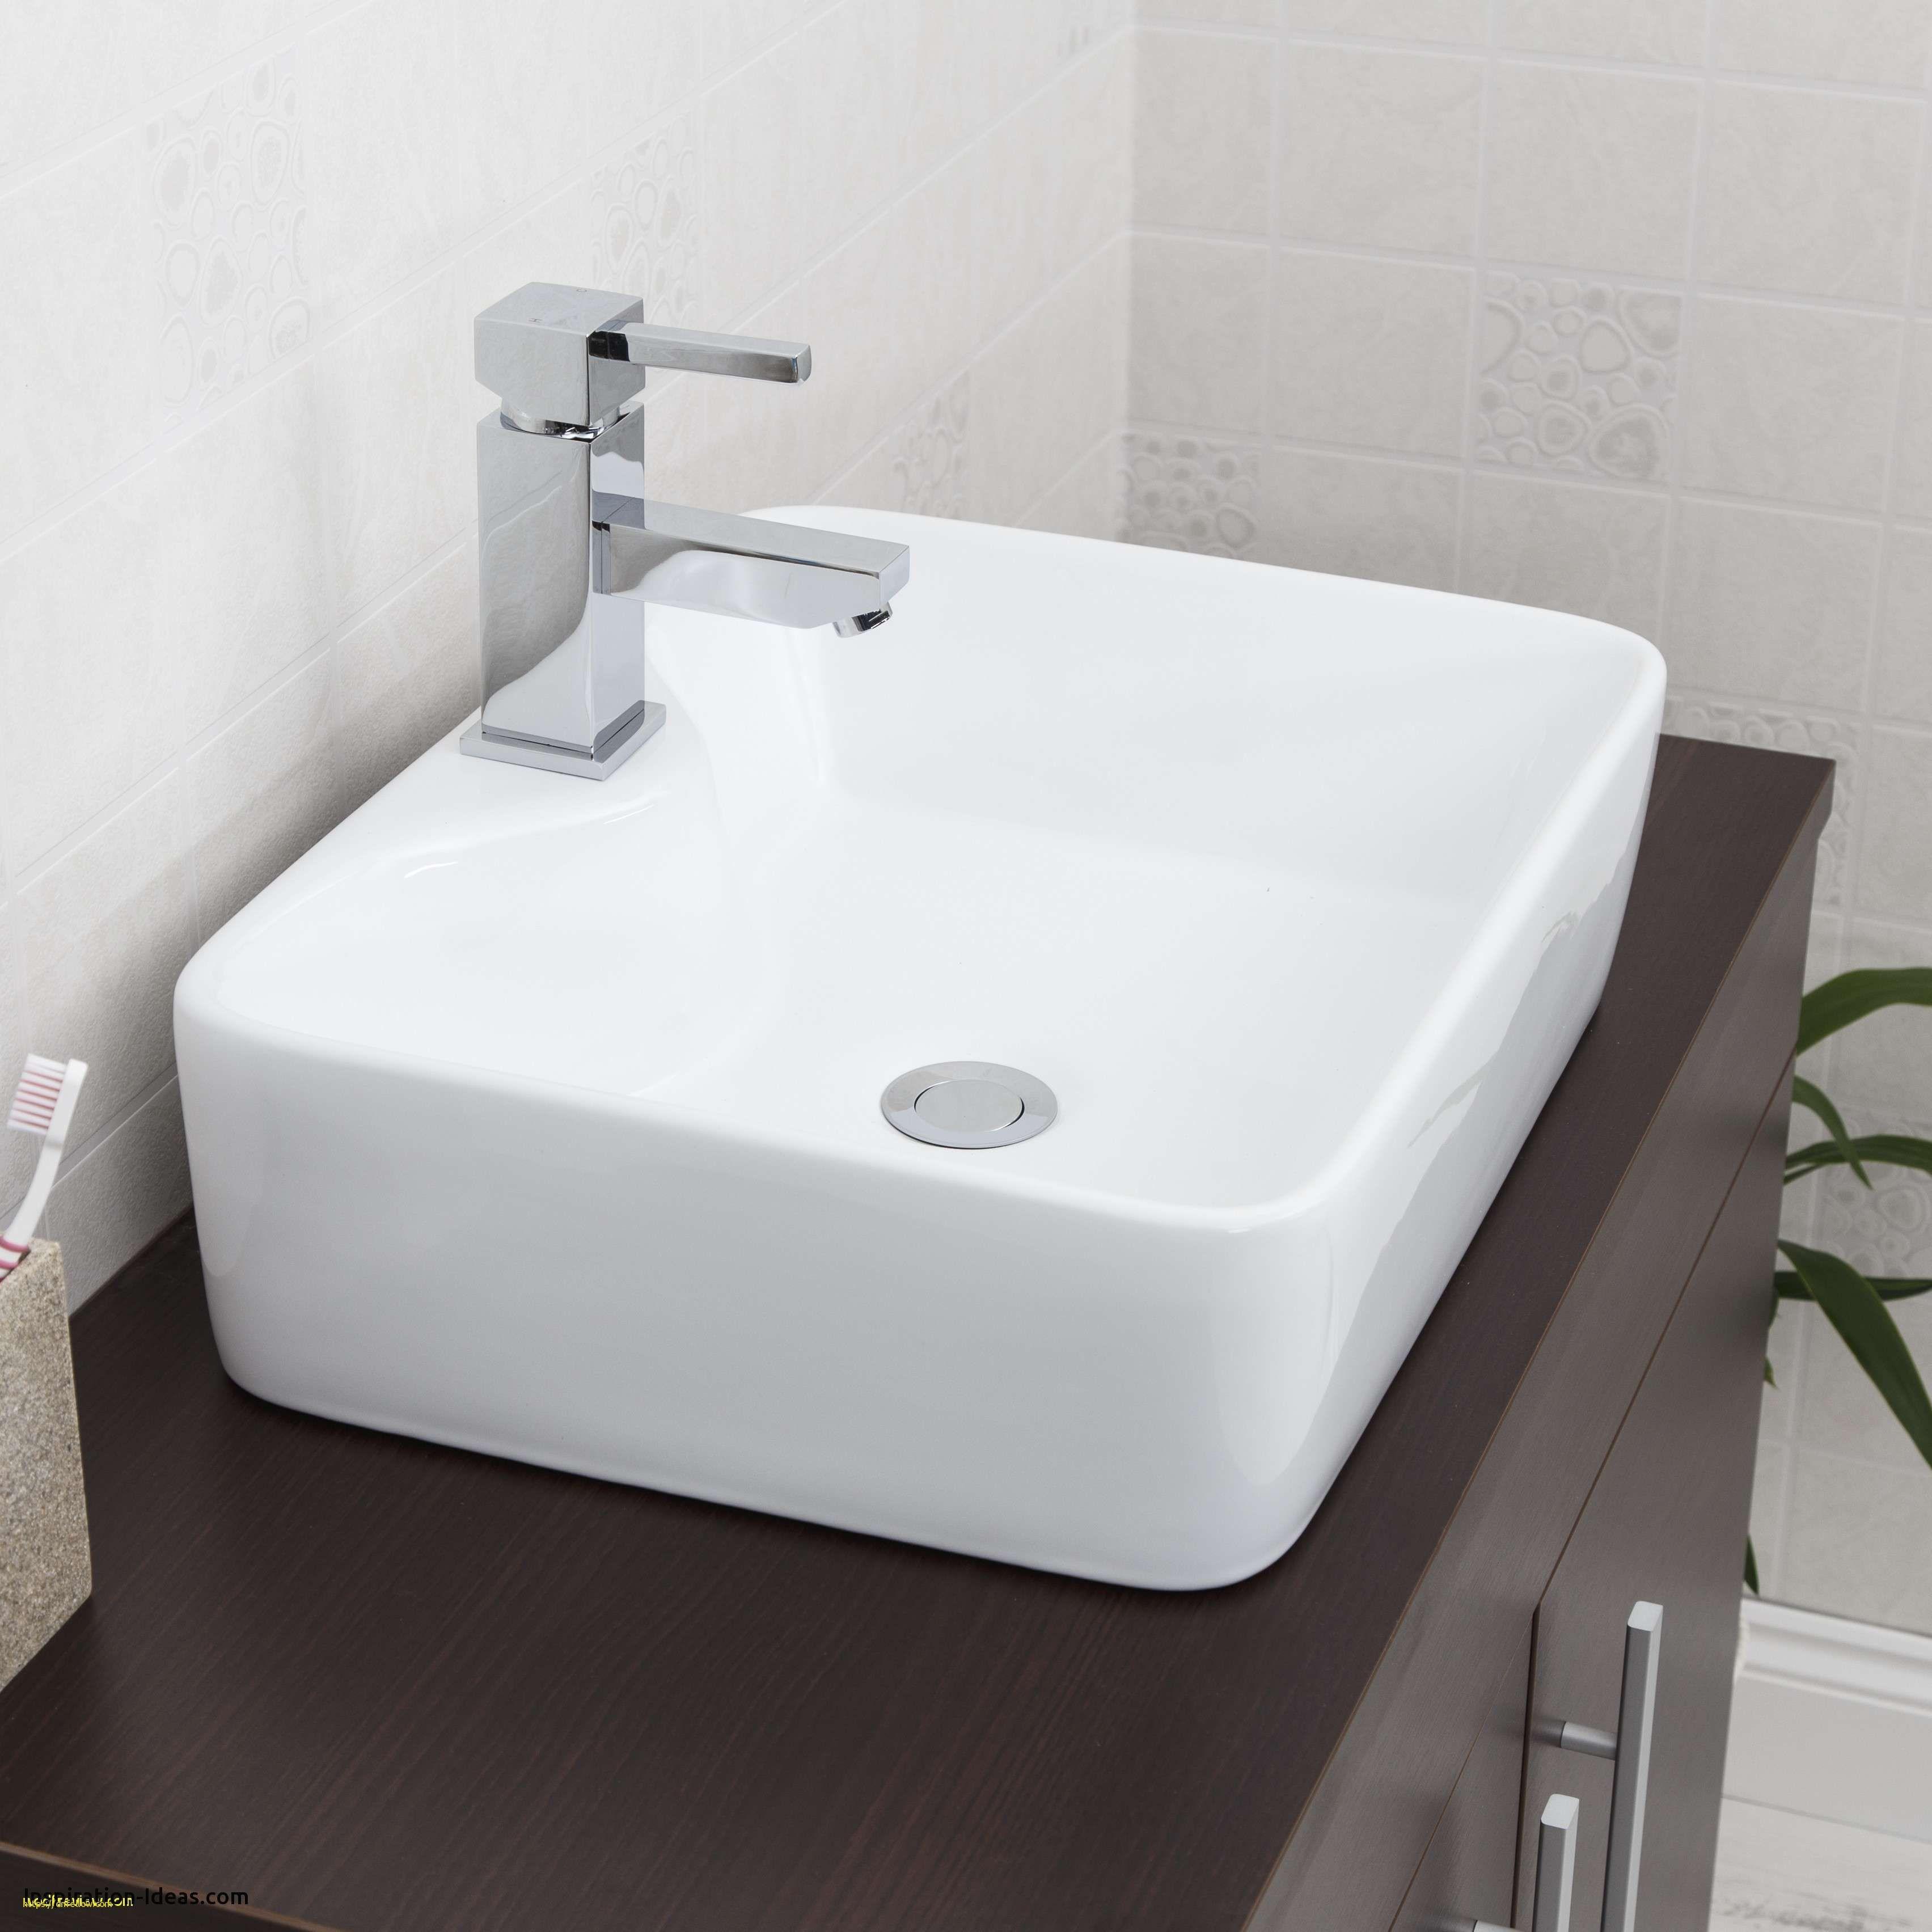 New New Zealand Bathroom Design New New Zealand Bathroom Design ...